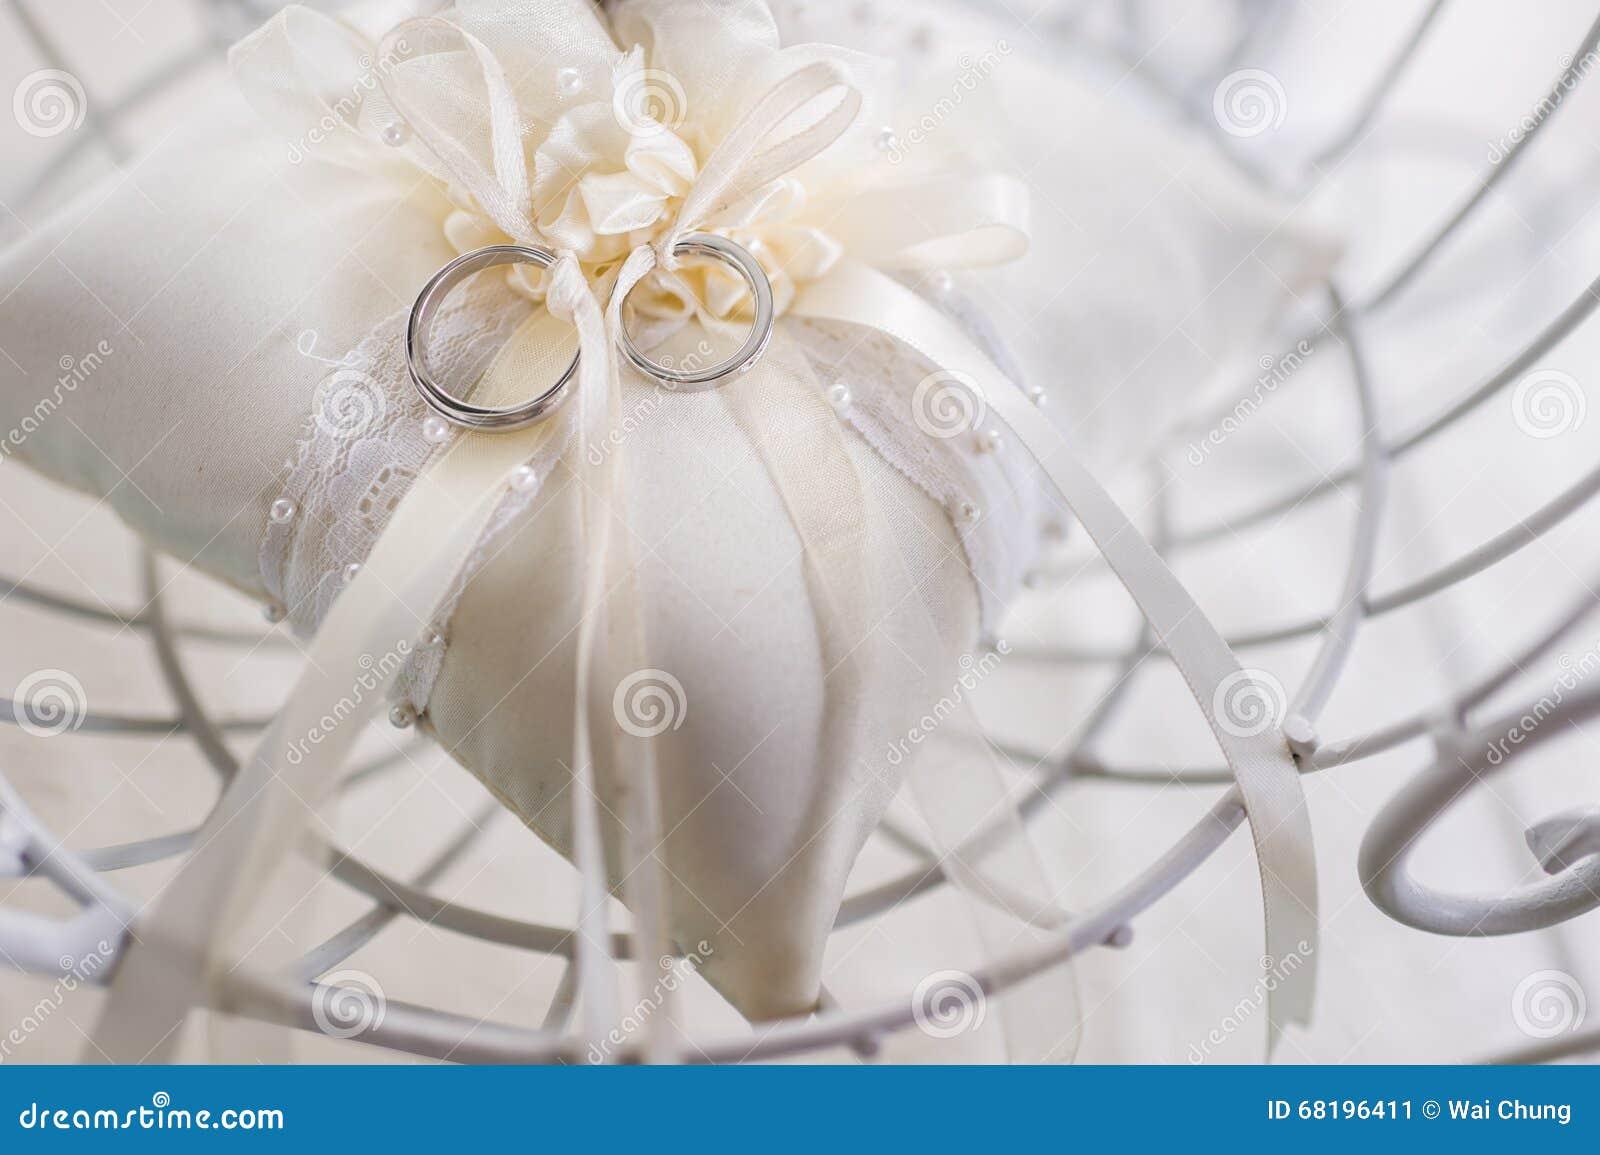 stock photo beautiful wedding bands tied together ring pillow image beautiful wedding bands Beautiful wedding bands